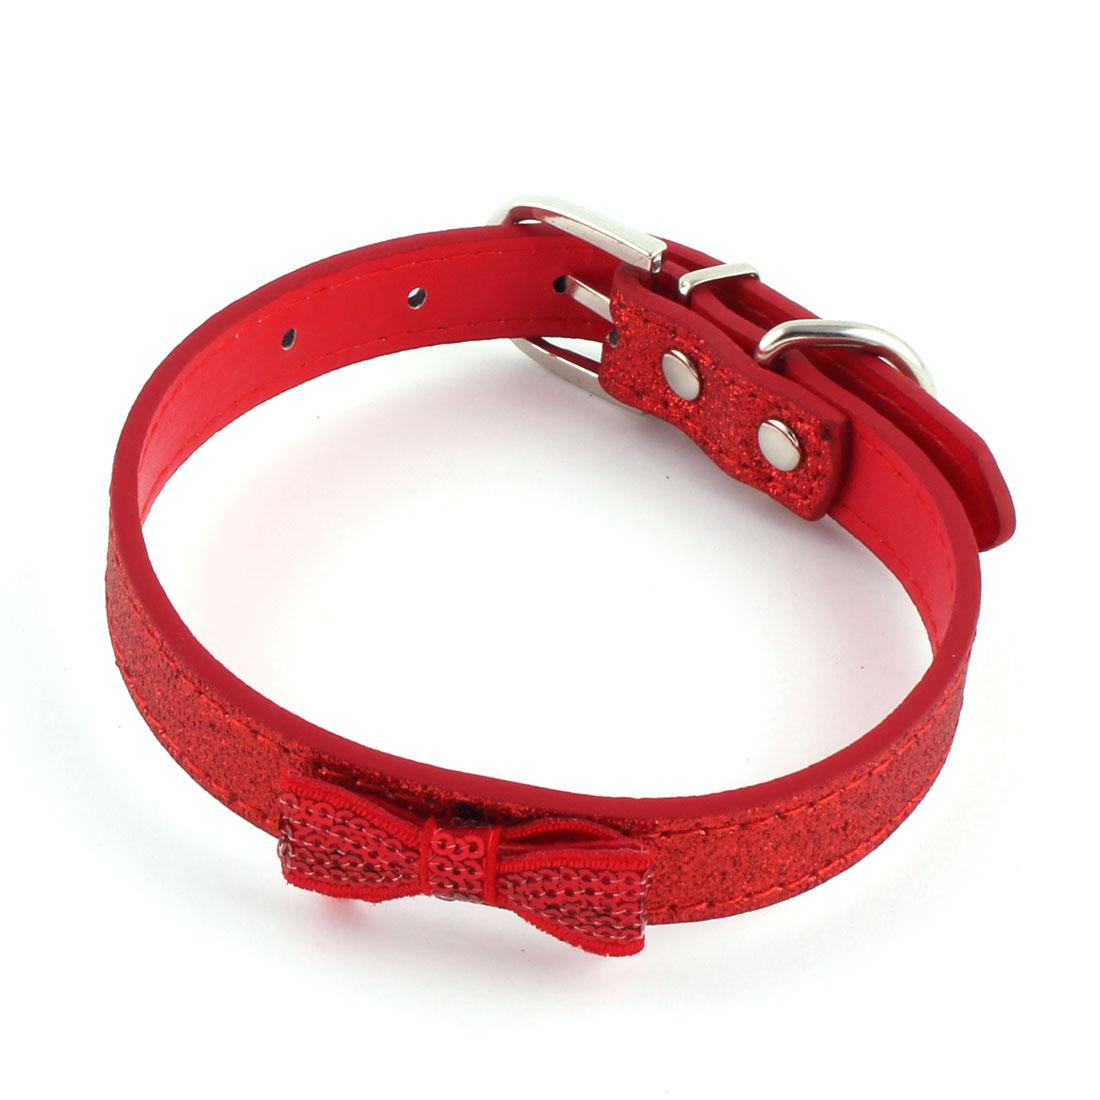 Pet Dog Cat Faux Leather Bowknot Pendant Sequin Decor Glowing Belt Strap Collar